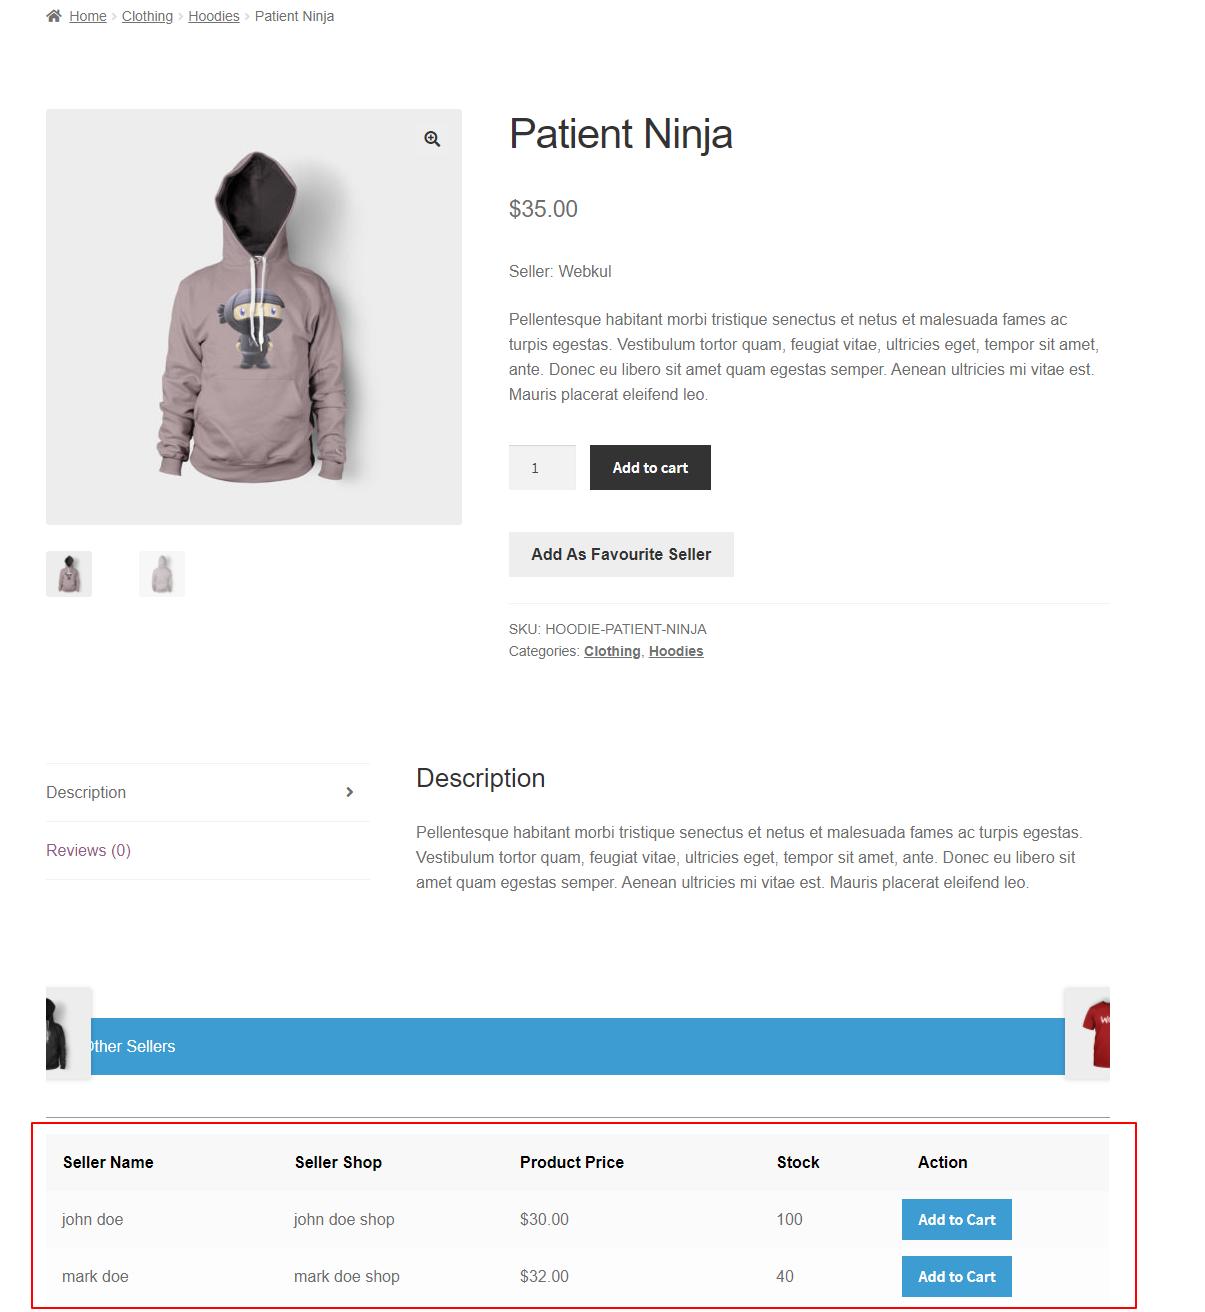 Patient-Ninja-–-Marketplace-Seller-Price-Comparison